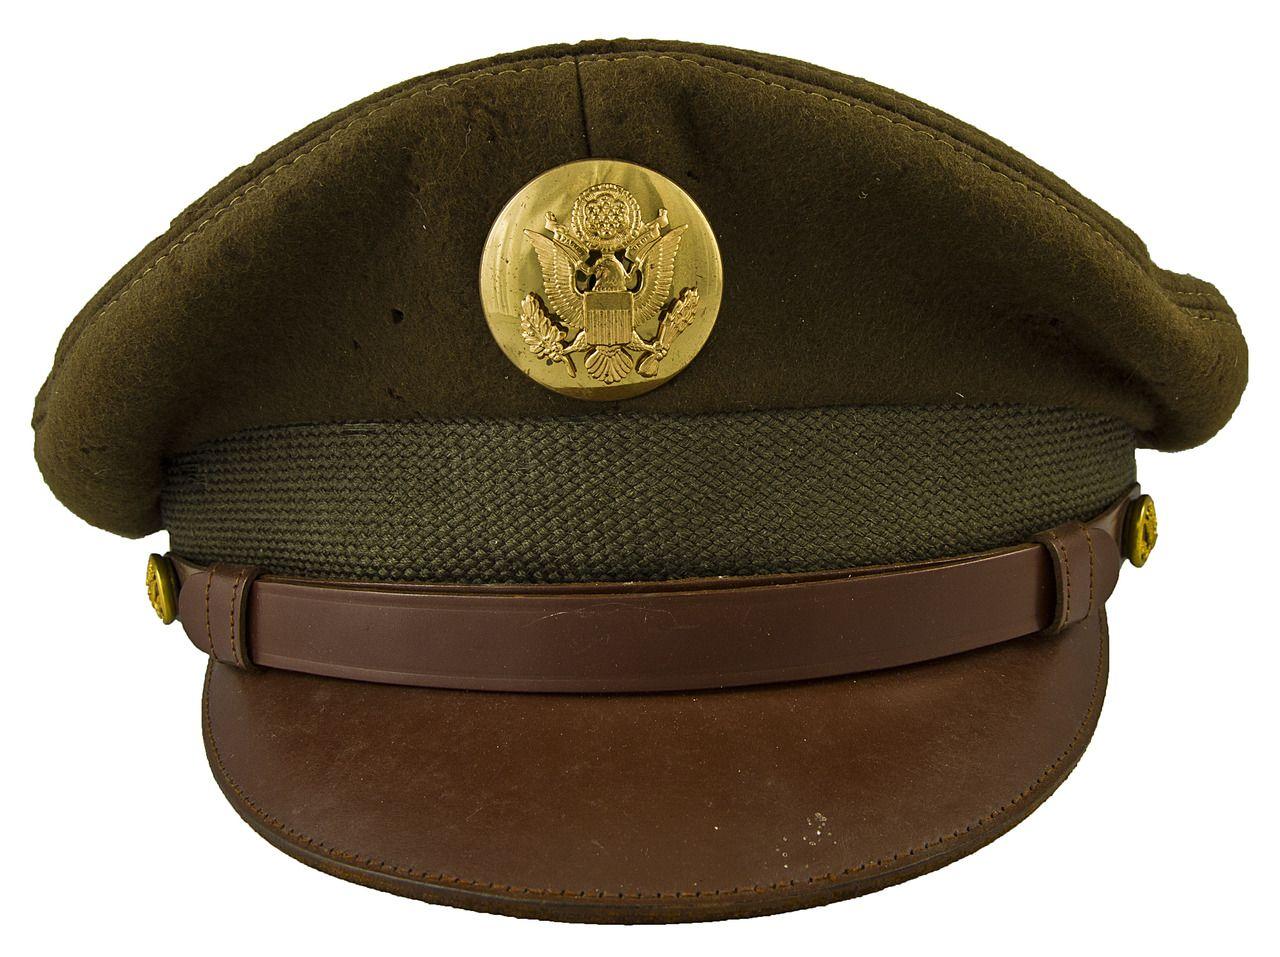 U S Army Enlisted Man S Visor Hat Wwii Military Cap Military Fashion Army Uniform